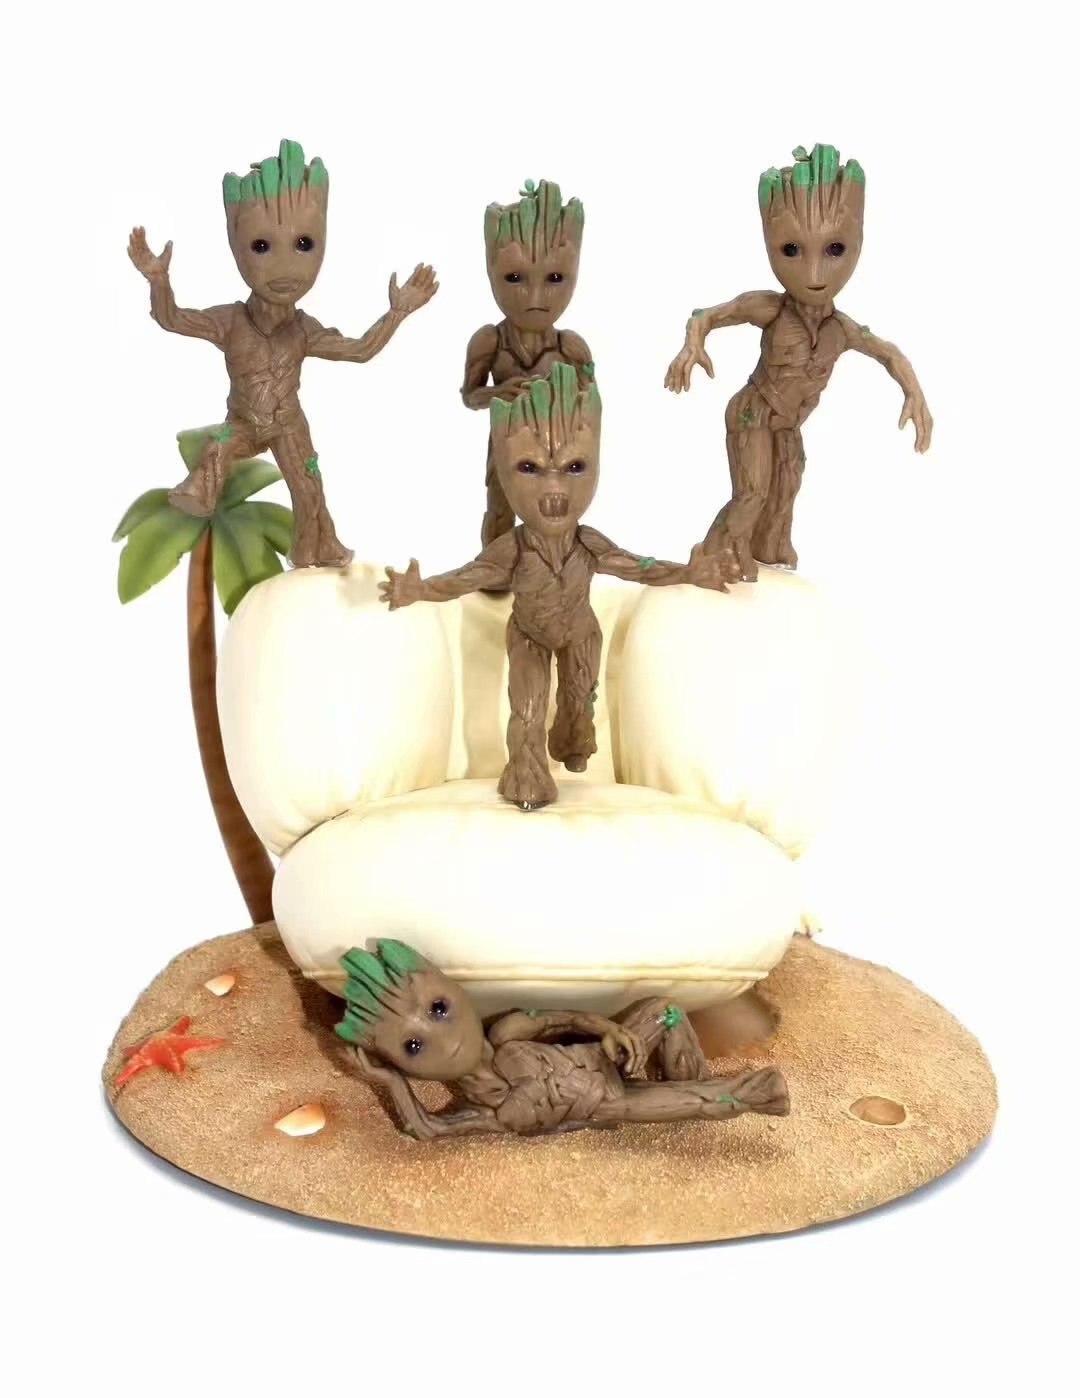 5Pcs The Avengers Groot Little Tree Man Modeling Decoration Boxed Figure 4-8cm